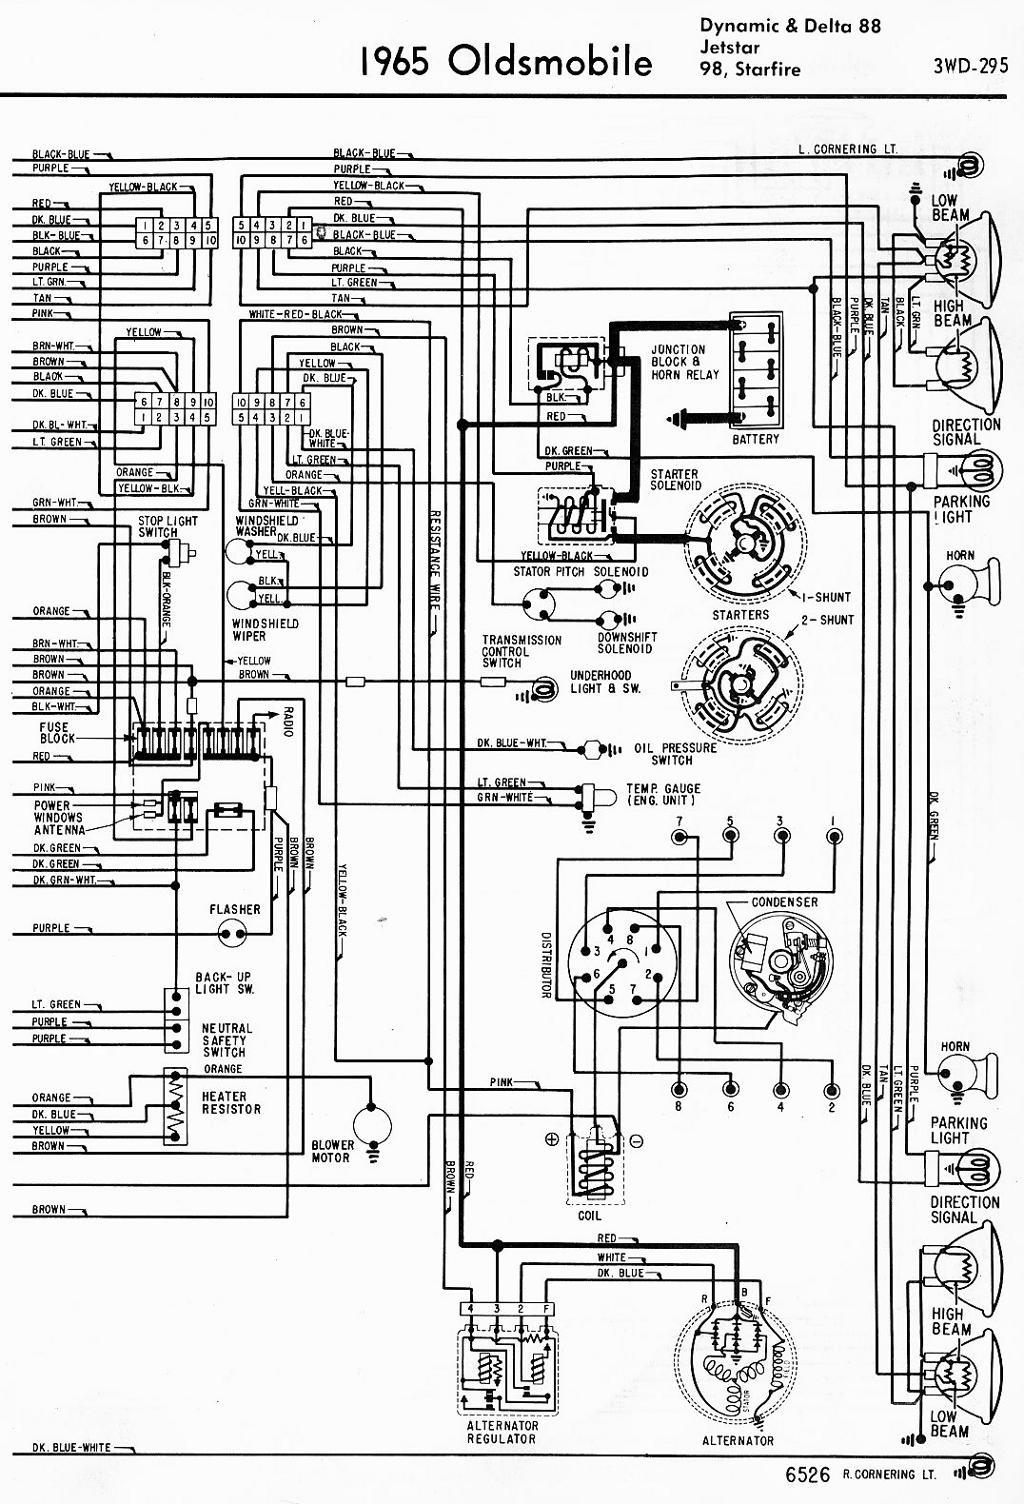 small resolution of 98 isuzu npr wiring diagram 98 jeep cherokee wiring isuzu truck wiring diagram 98 isuzu rodeo wiring diagram